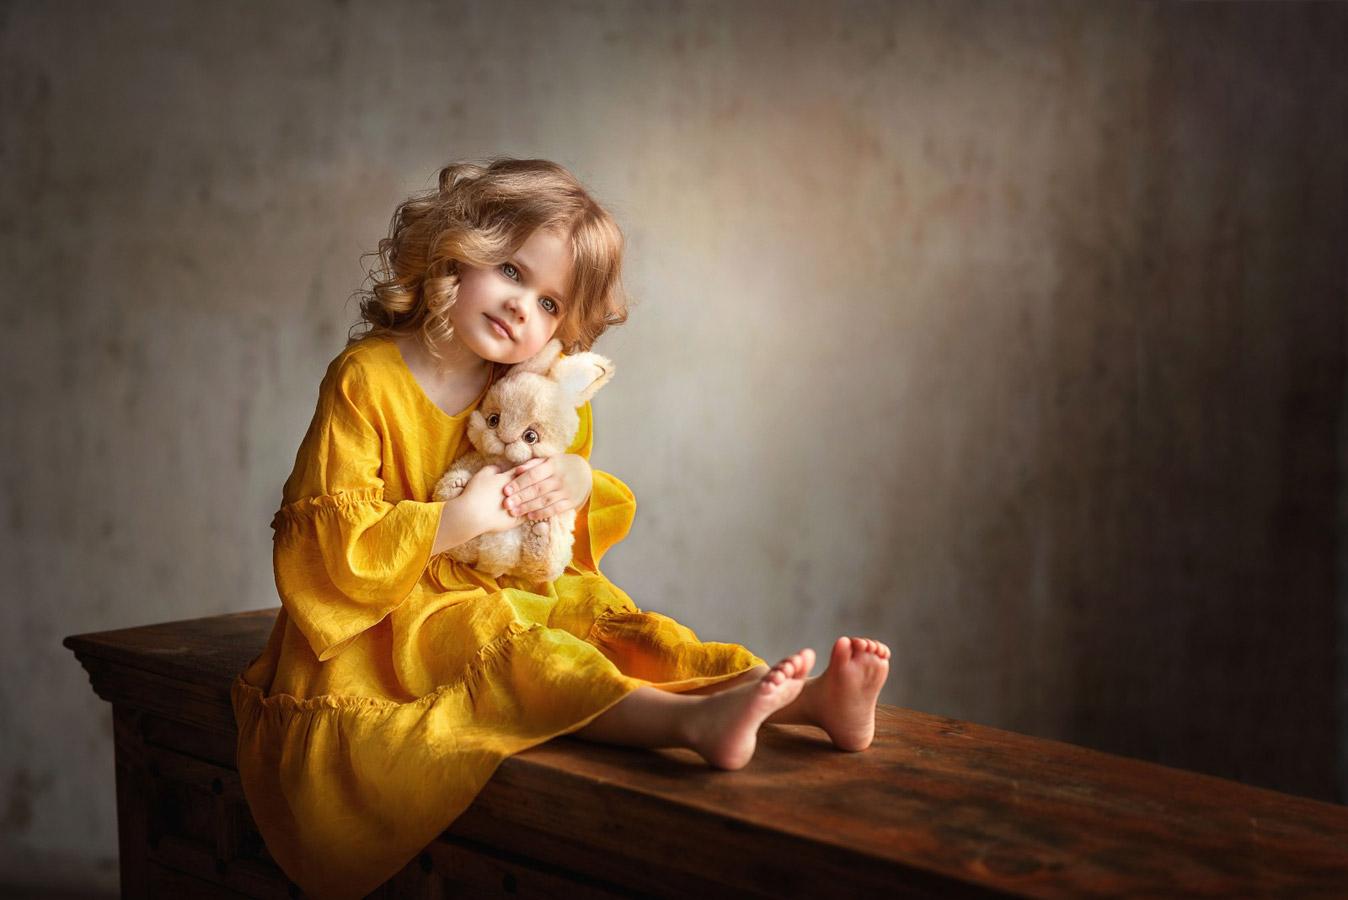 Кукла, © Оксана Воронина, Фотоконкурс Family Russian Photo Award журнала «Российское фото»